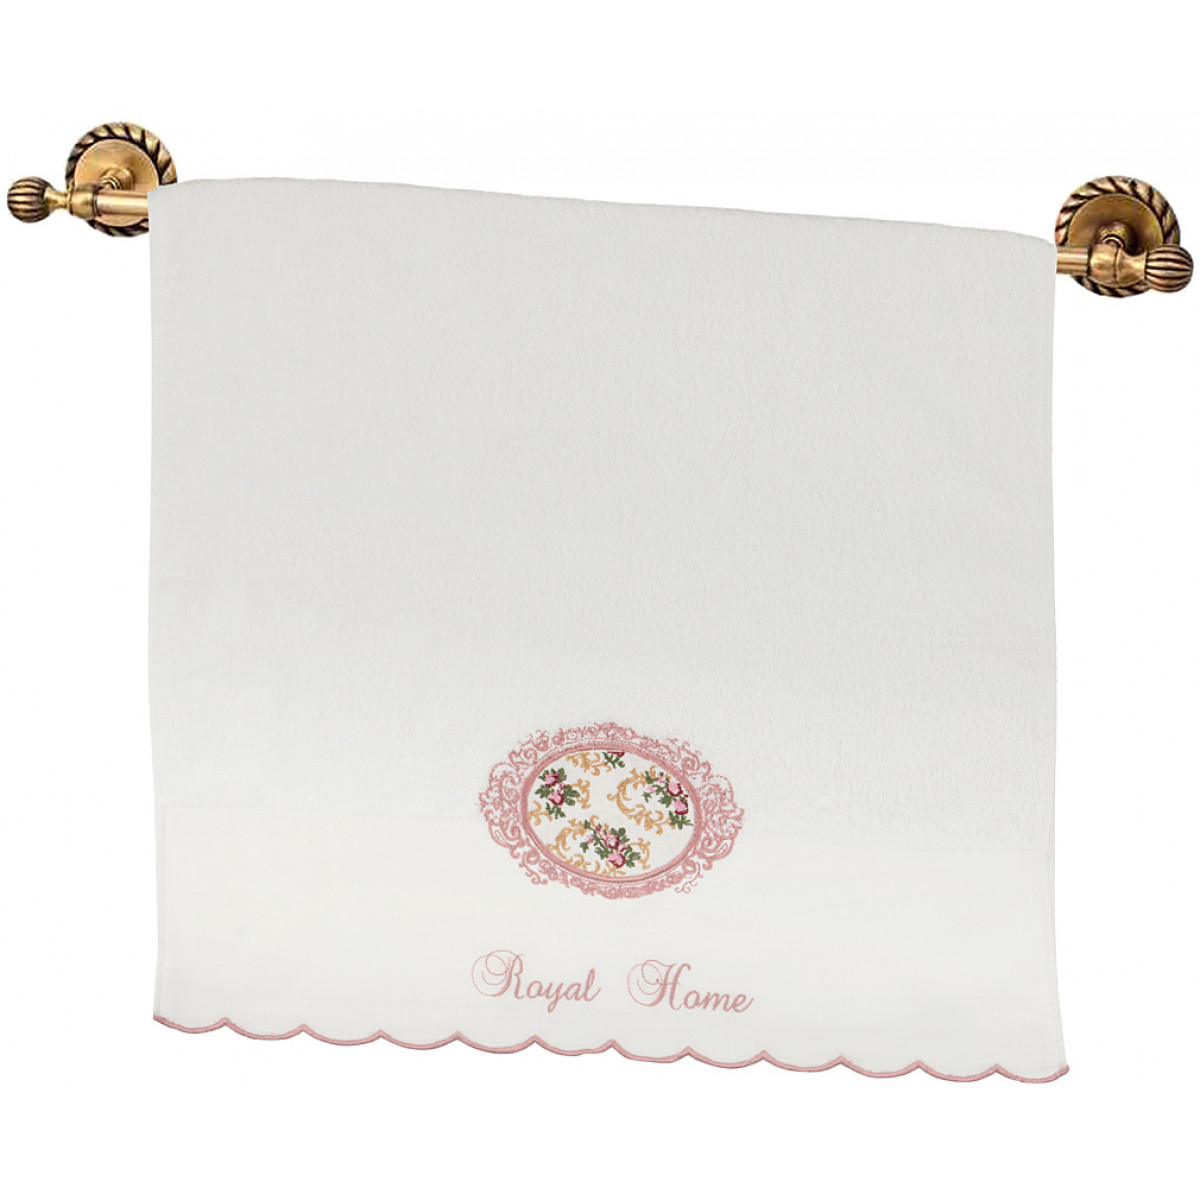 Полотенца Santalino Полотенце Emma  (50х90 см) полотенце денастия полотенце денастия 50х90 см хлопок